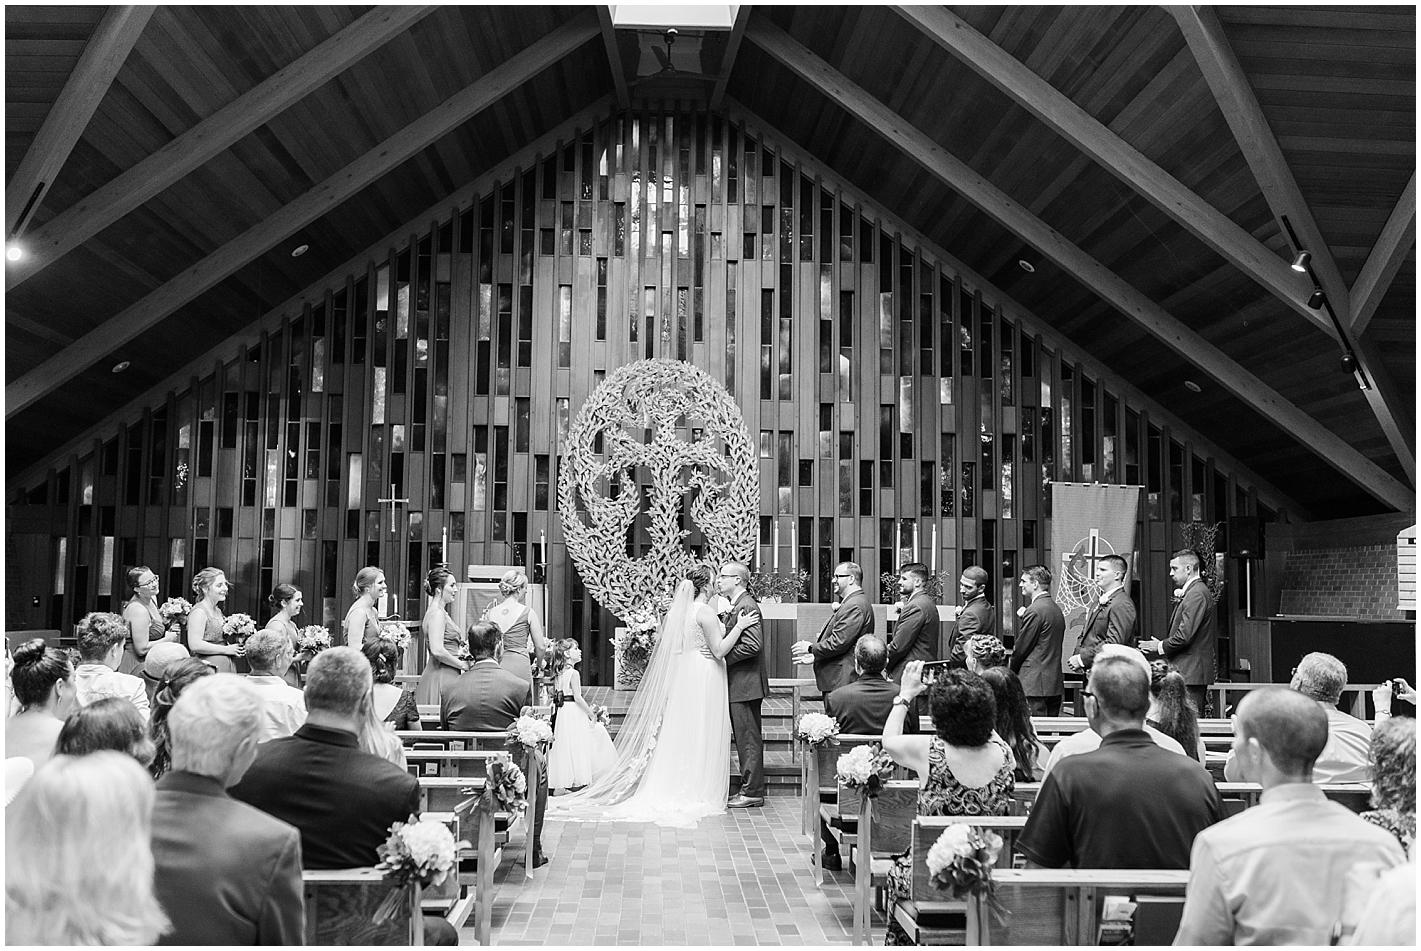 Merrimack Valley Wedding Photos By Alyssa Parker Photography